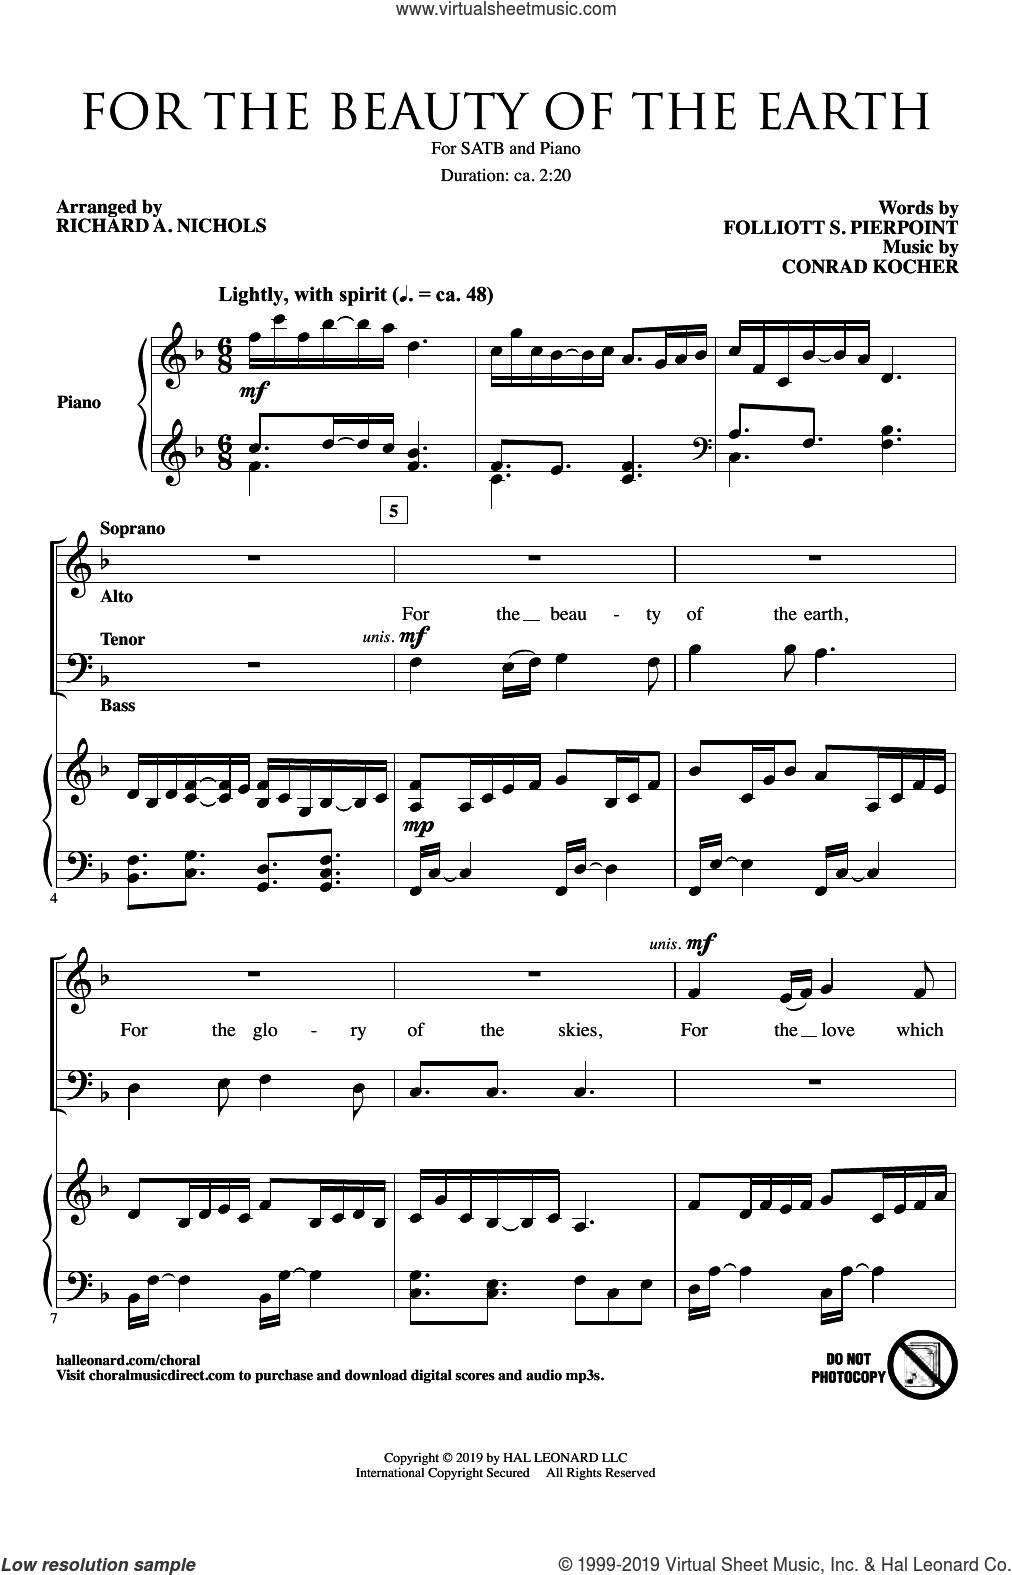 For The Beauty Of The Earth (arr. Richard A. Nichols) sheet music for choir (SATB: soprano, alto, tenor, bass) by Conrad Kocher, Richard A. Nichols, Folliot S. Pierpoint and Folliot S. Pierpoint & Conrad Kocher, intermediate skill level